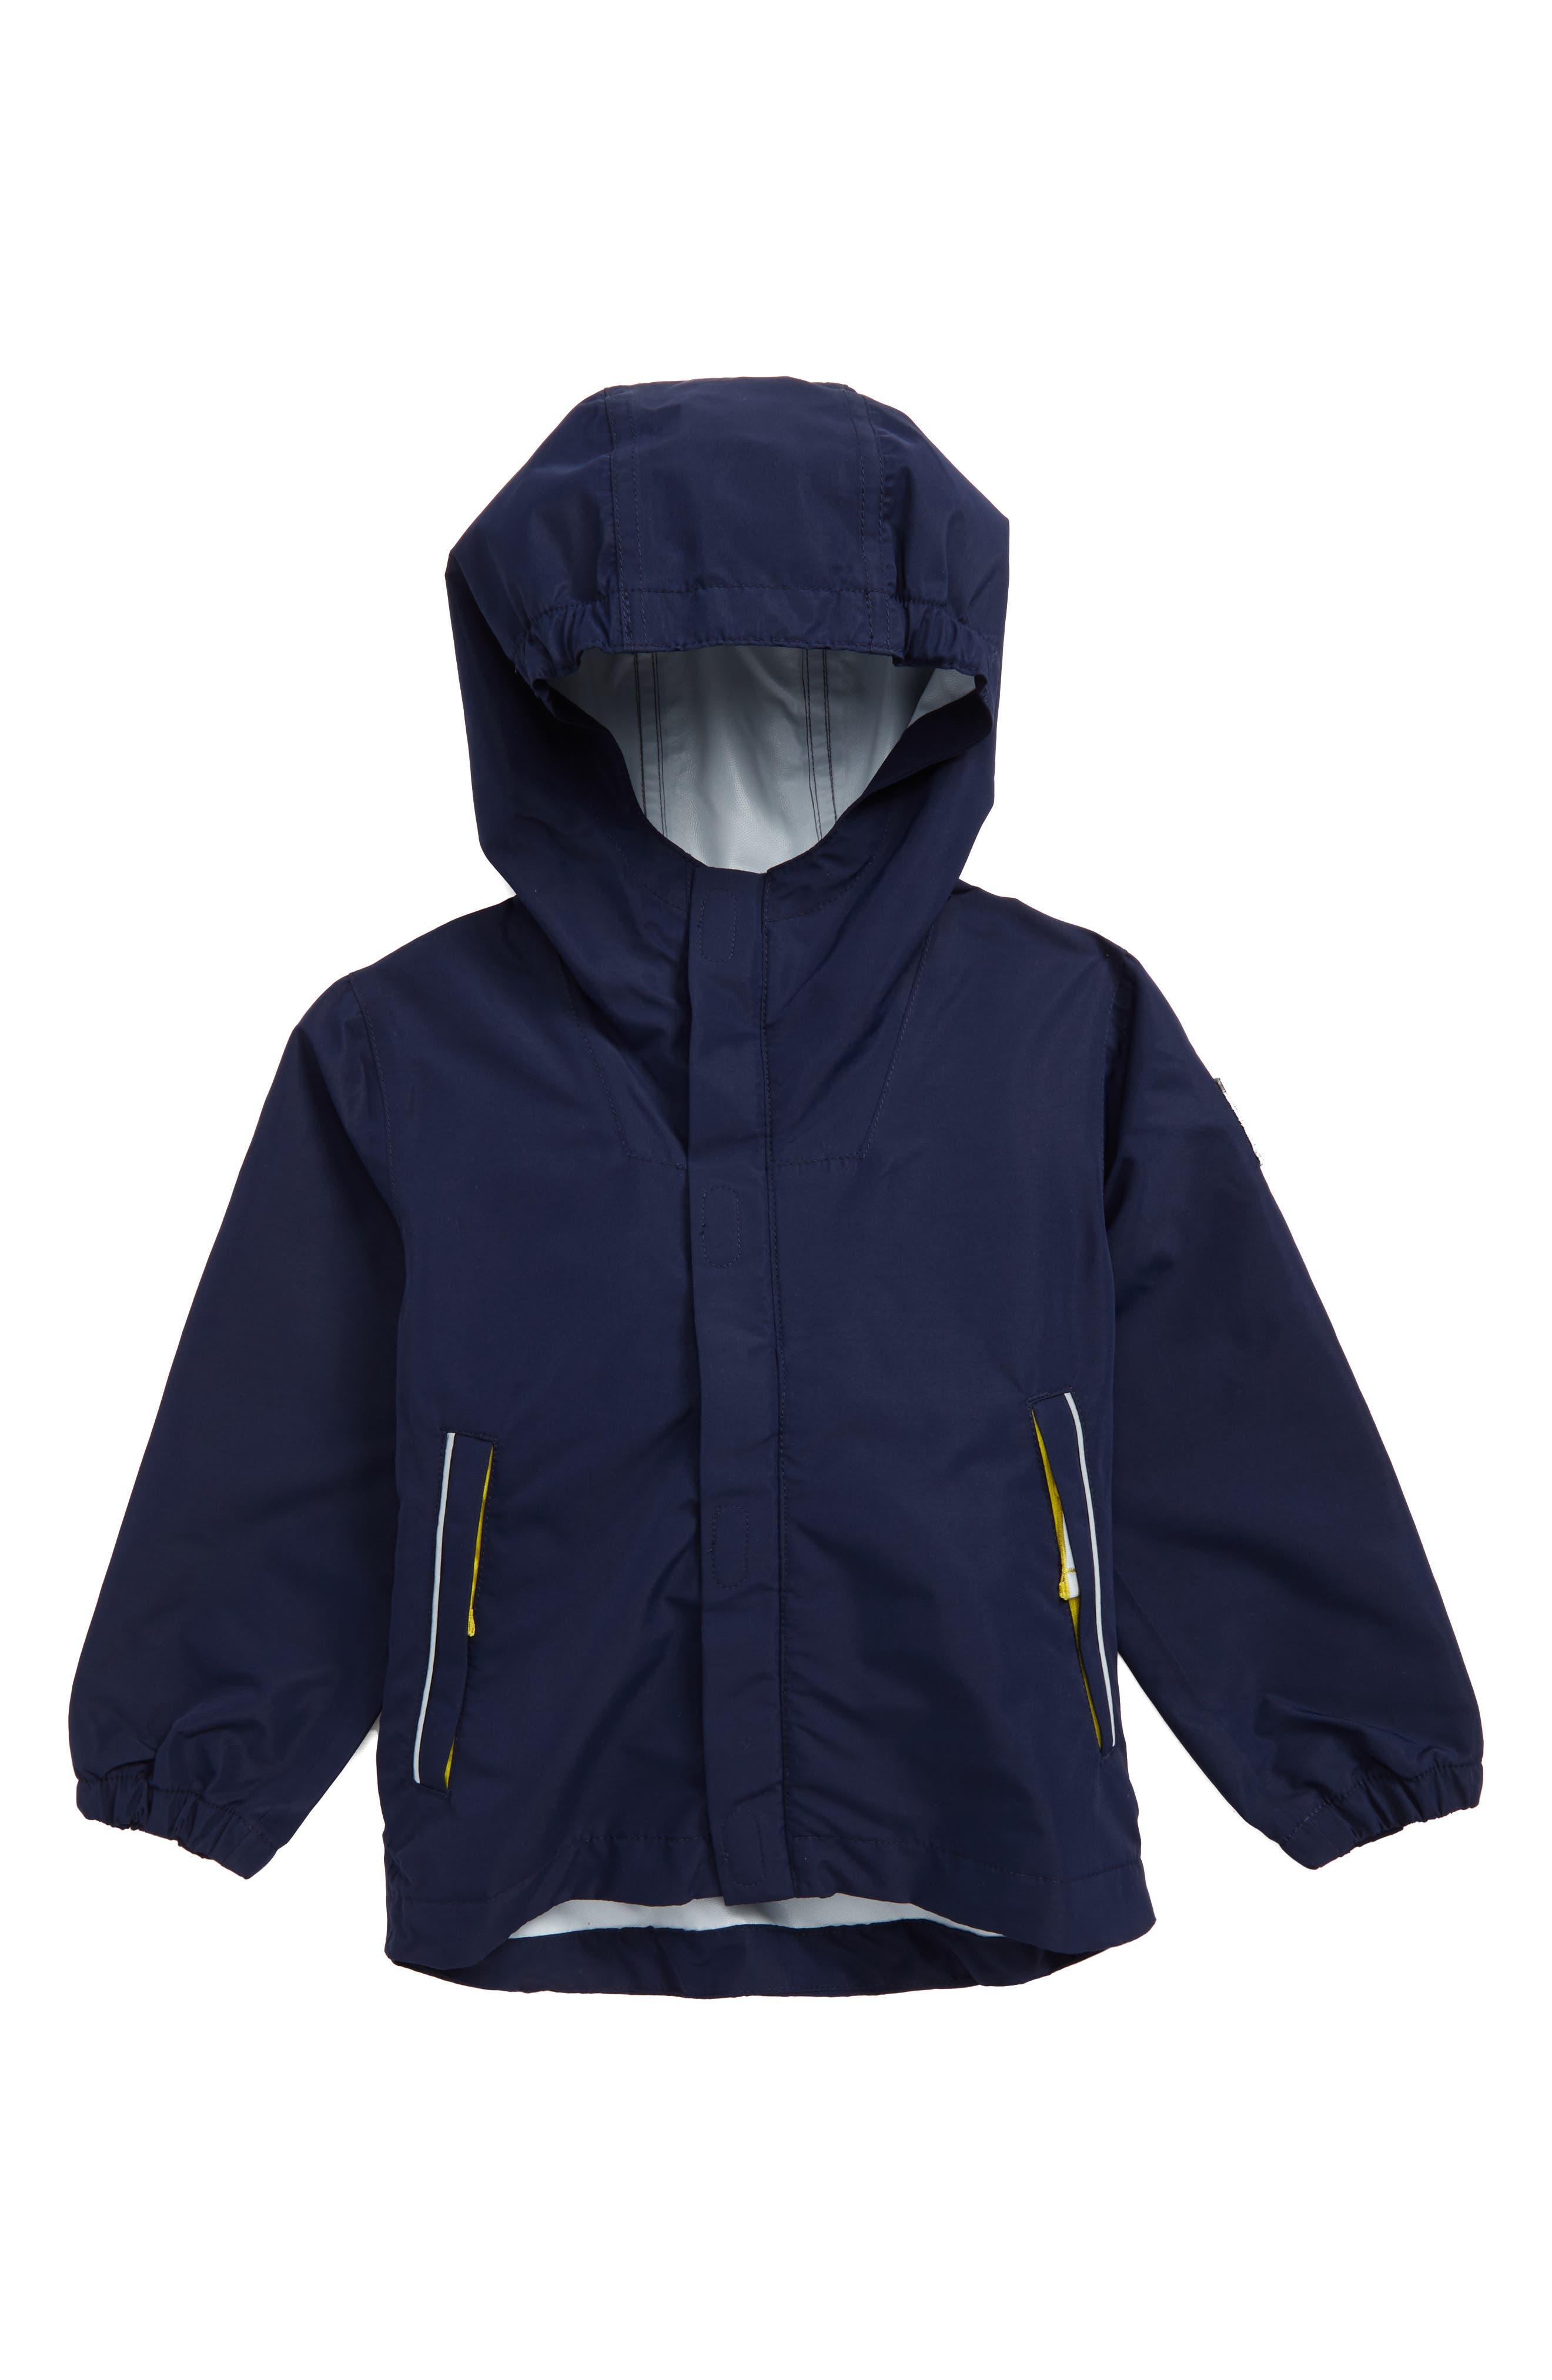 Main Image - Mini Boden Packaway Waterproof Jacket (Toddler Boys, Little Boys & Big Boys)